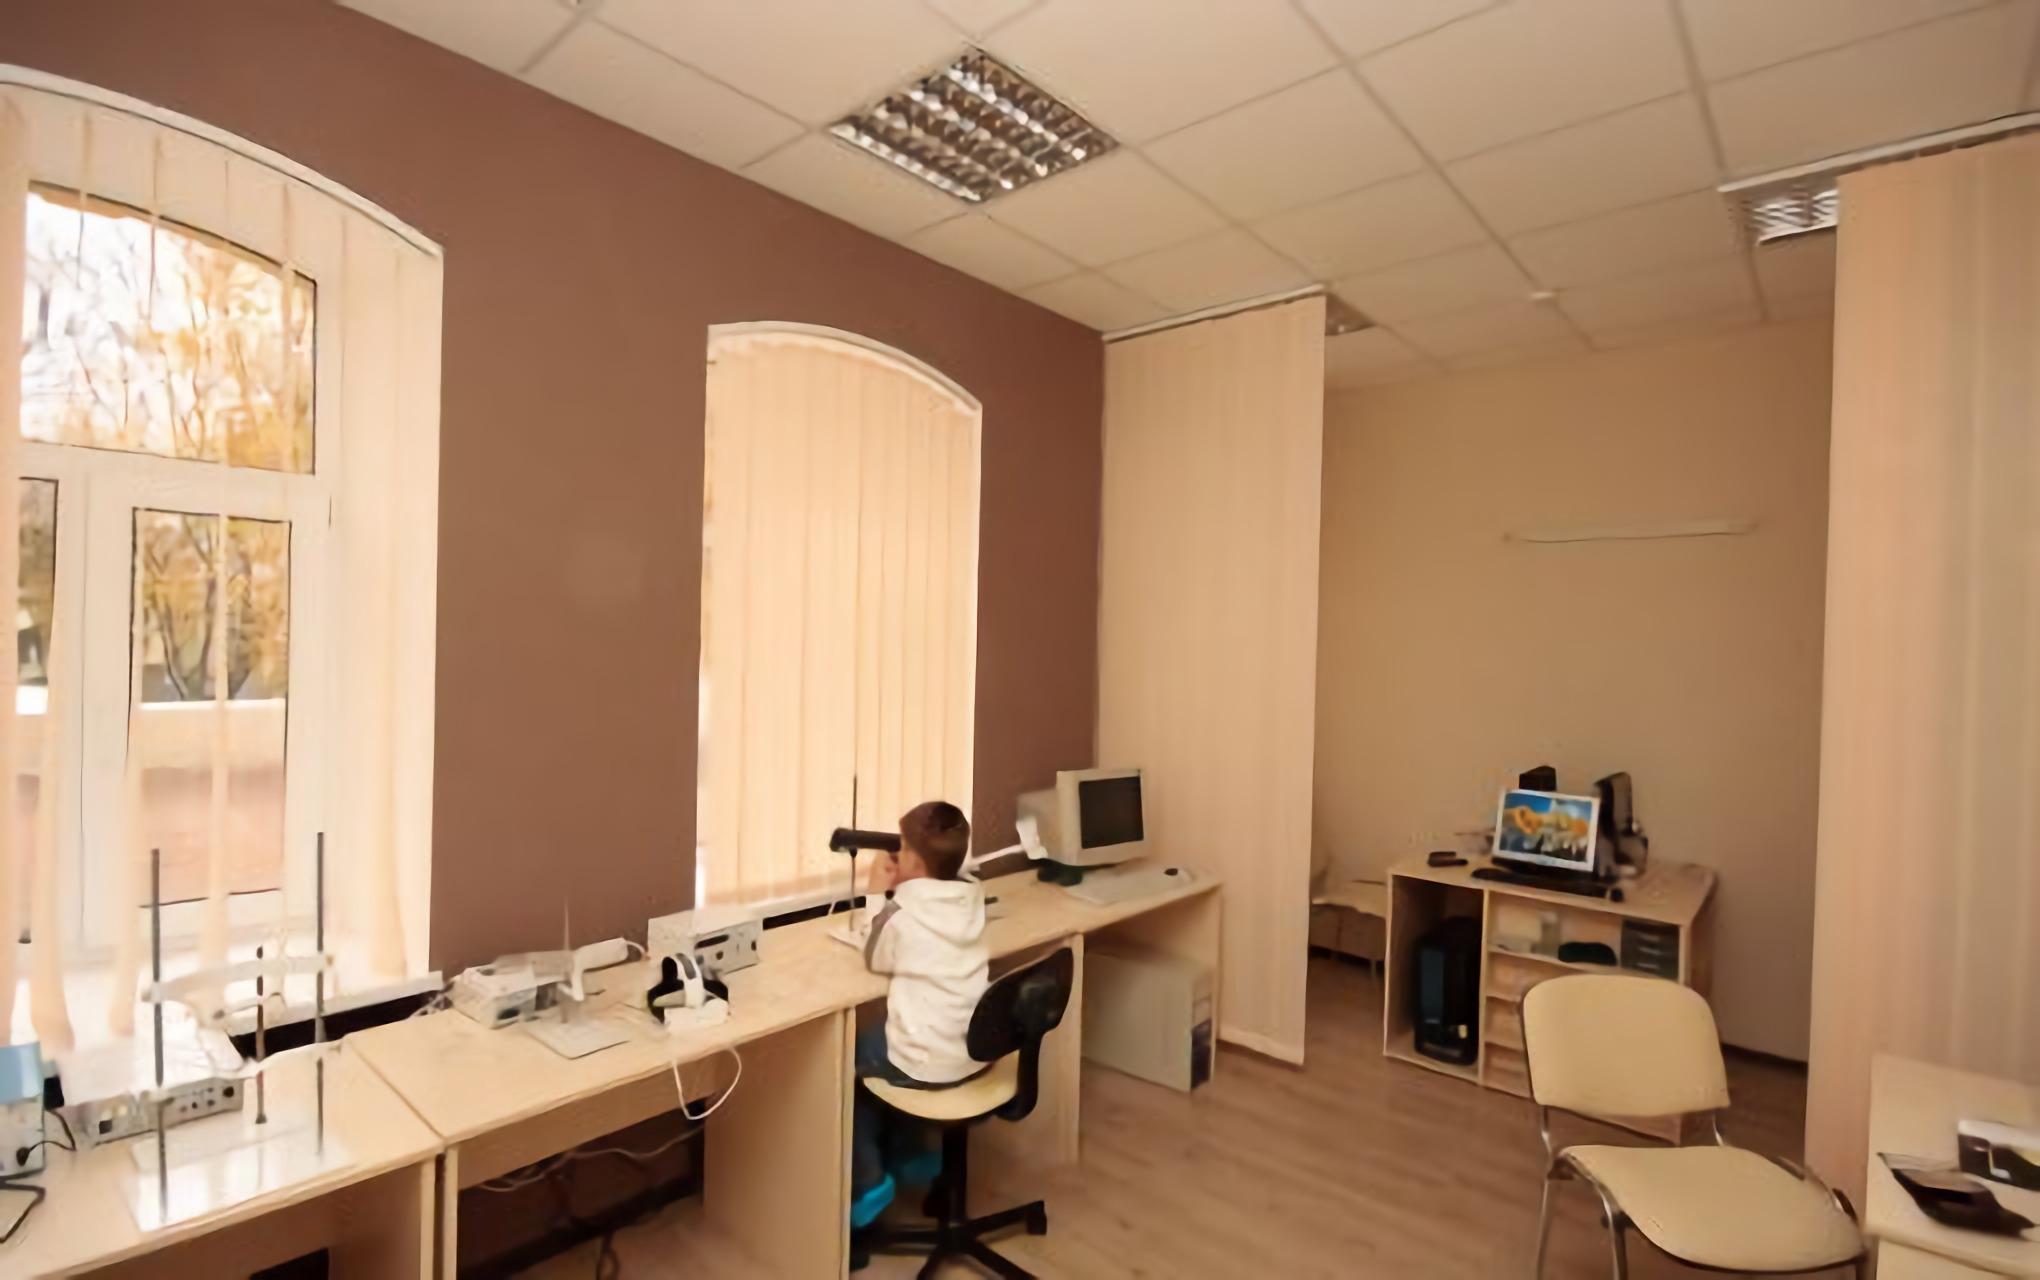 Children's ophthalmology in Kharkiv